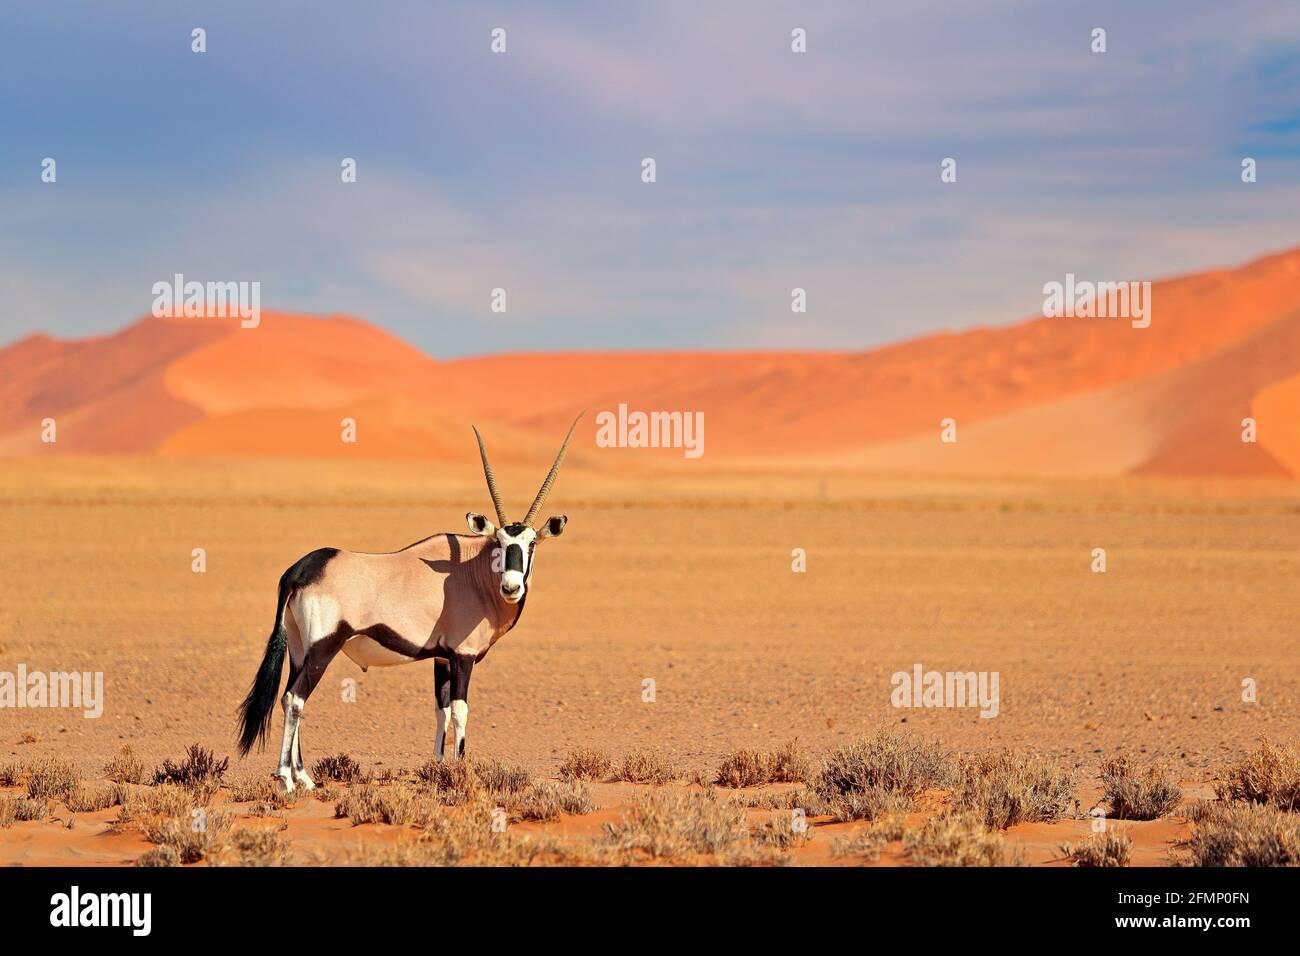 Gemsbok with orange sand dune evening sunset. Gemsbuck, Oryx gazella, large antelope in nature habitat, Sossusvlei, Namibia. Wild animals in the savan Stock Photo